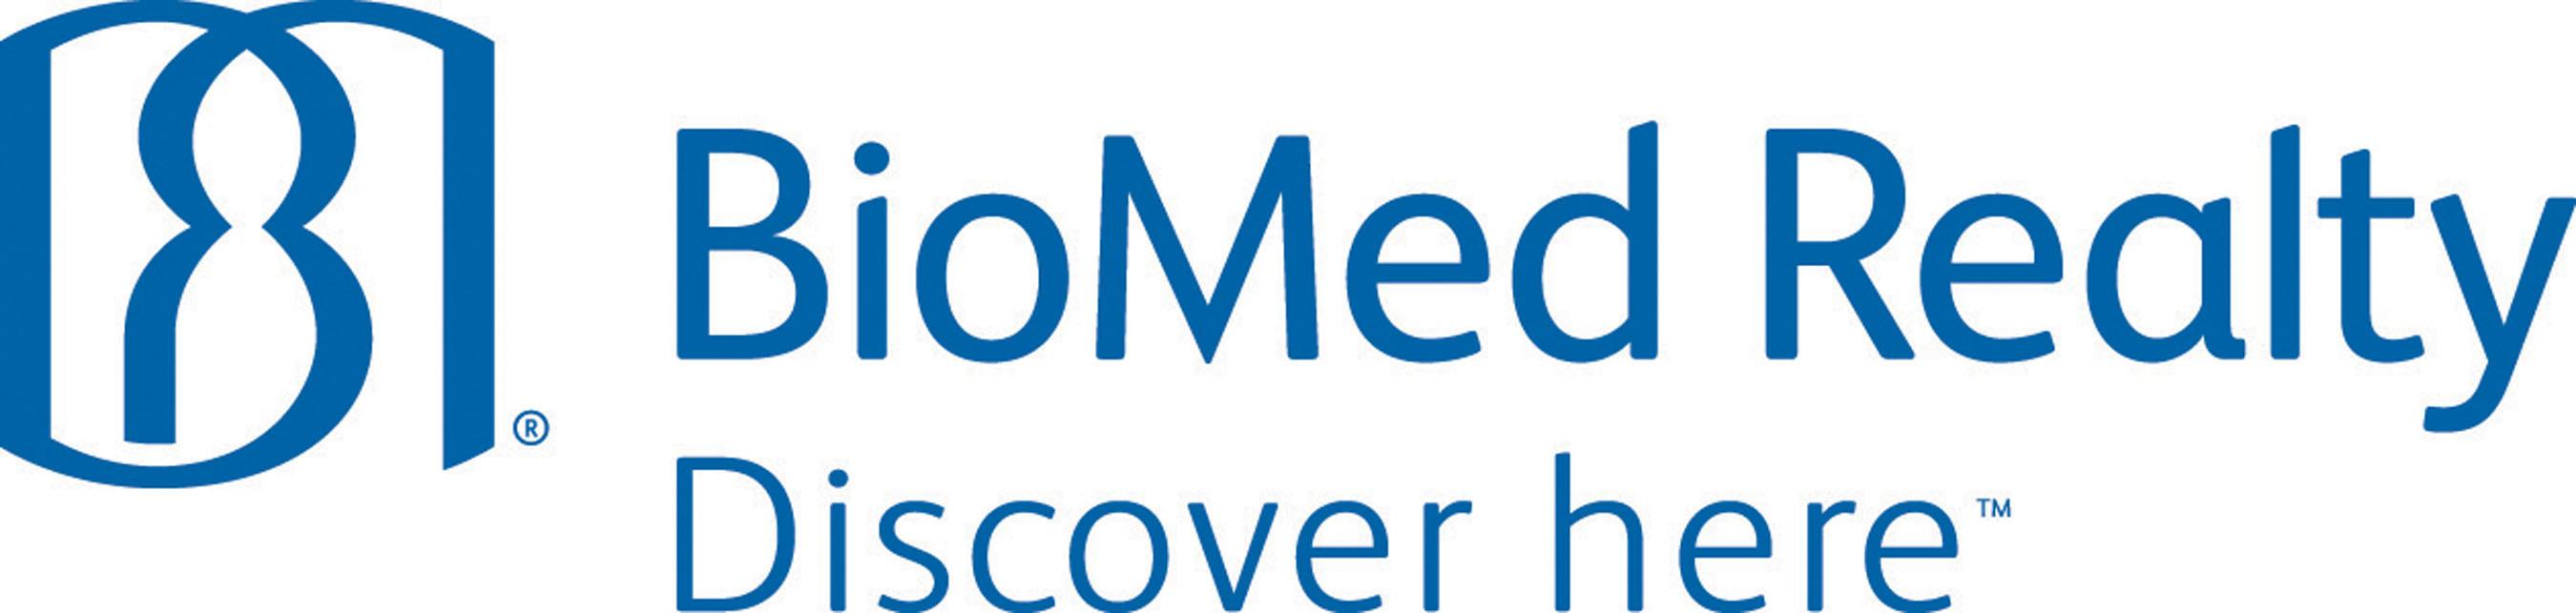 BioMed Realty Trust Logo. (PRNewsFoto/BioMed Realty Trust) (PRNewsFoto/)